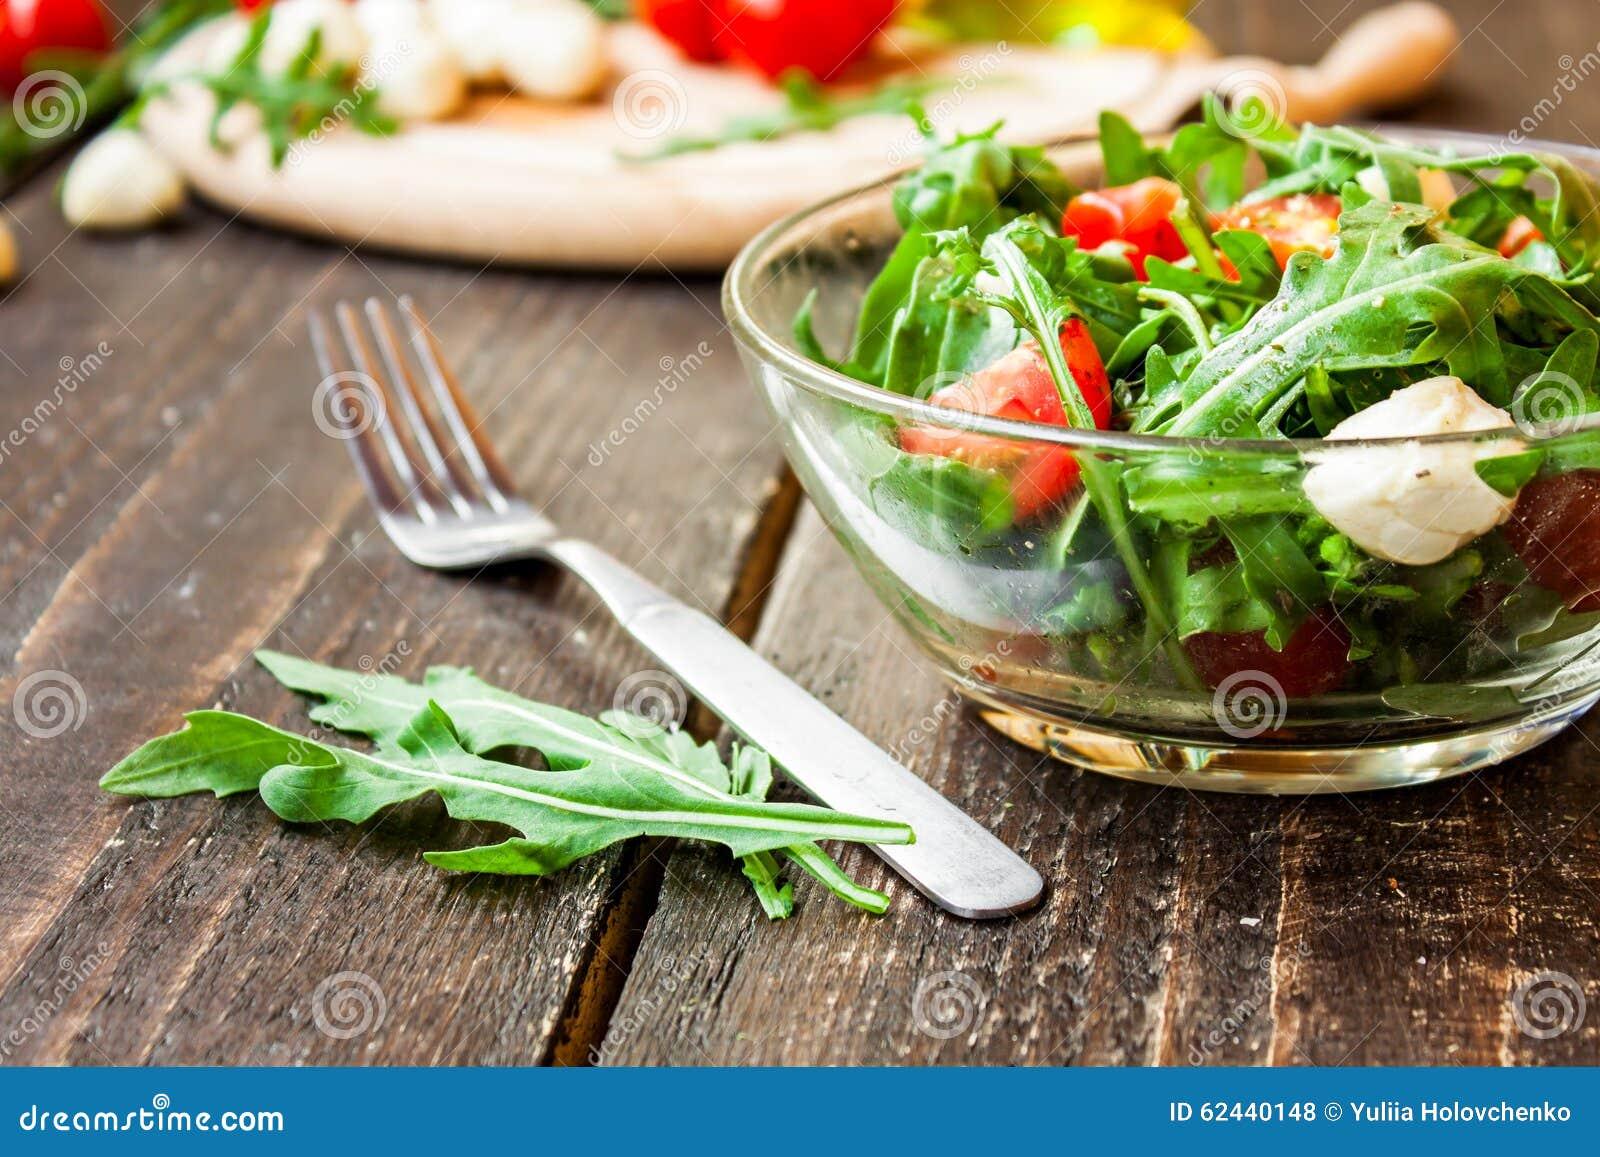 caprese salat mit mozzarella tomaten und arugula stockfoto bild 62440148. Black Bedroom Furniture Sets. Home Design Ideas